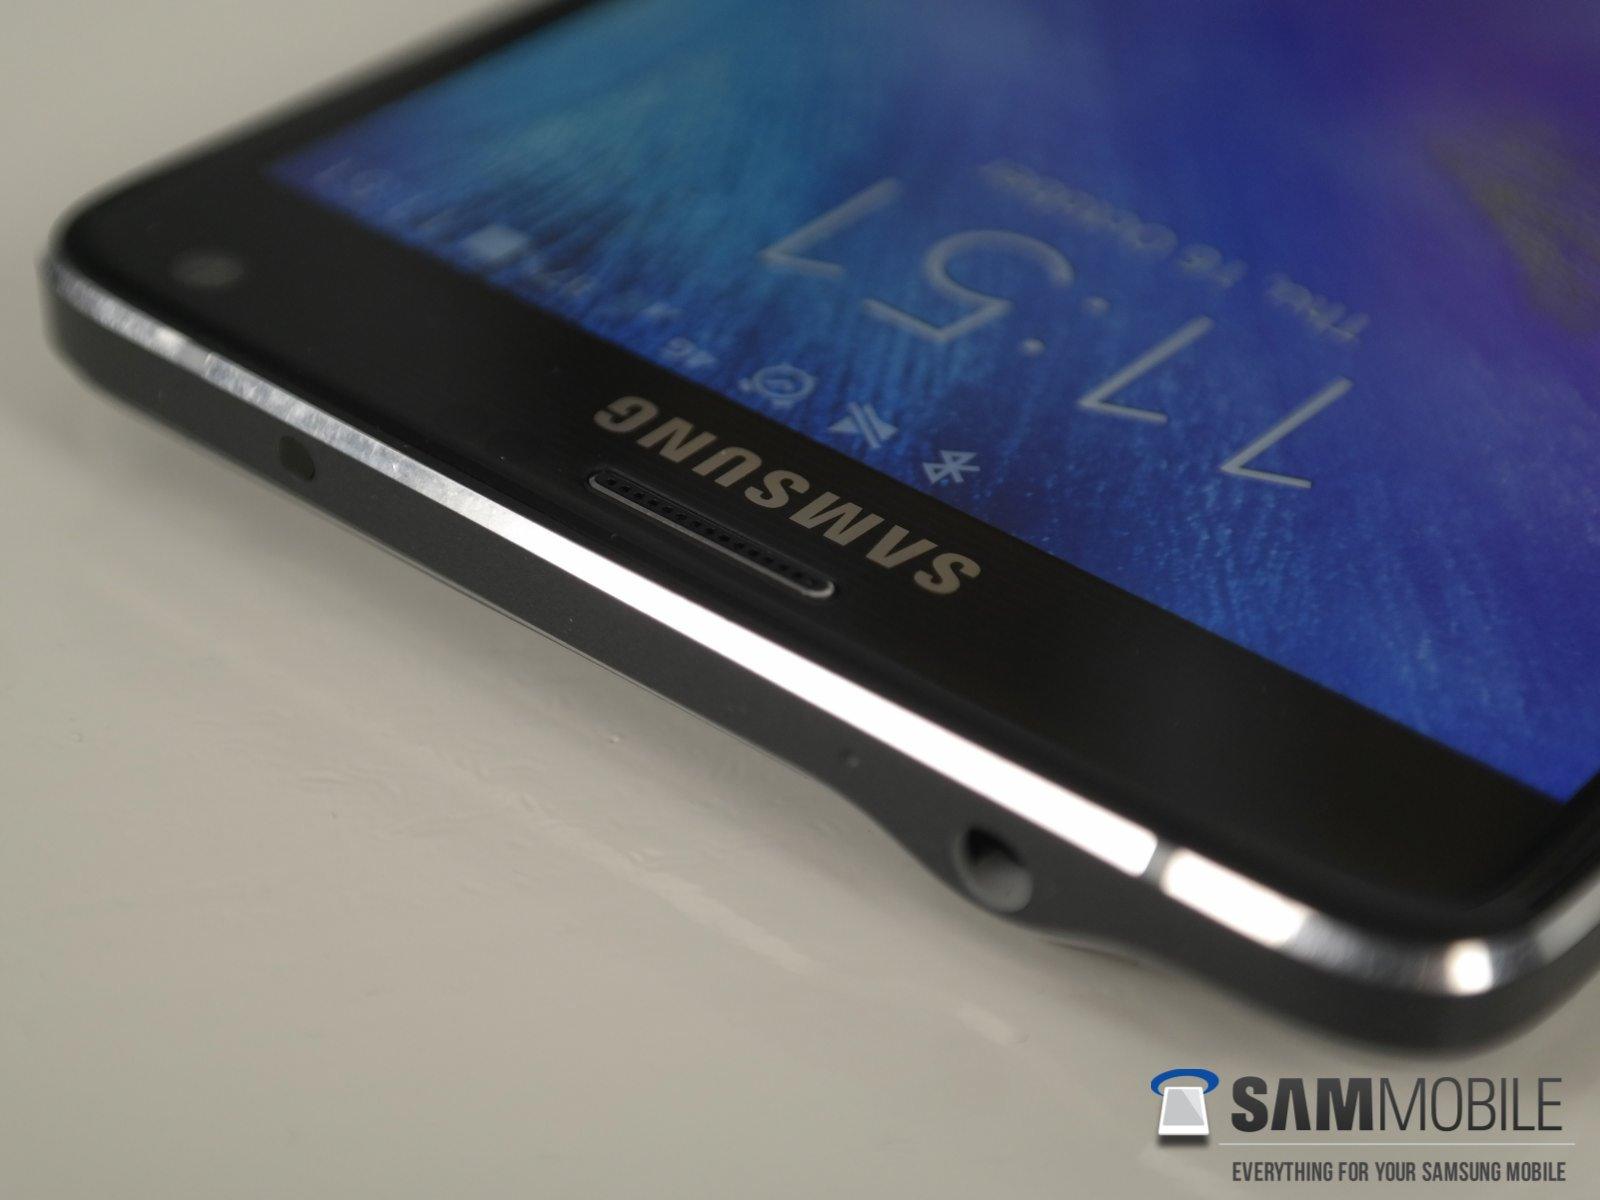 Samsung Note 2 Firmware Download